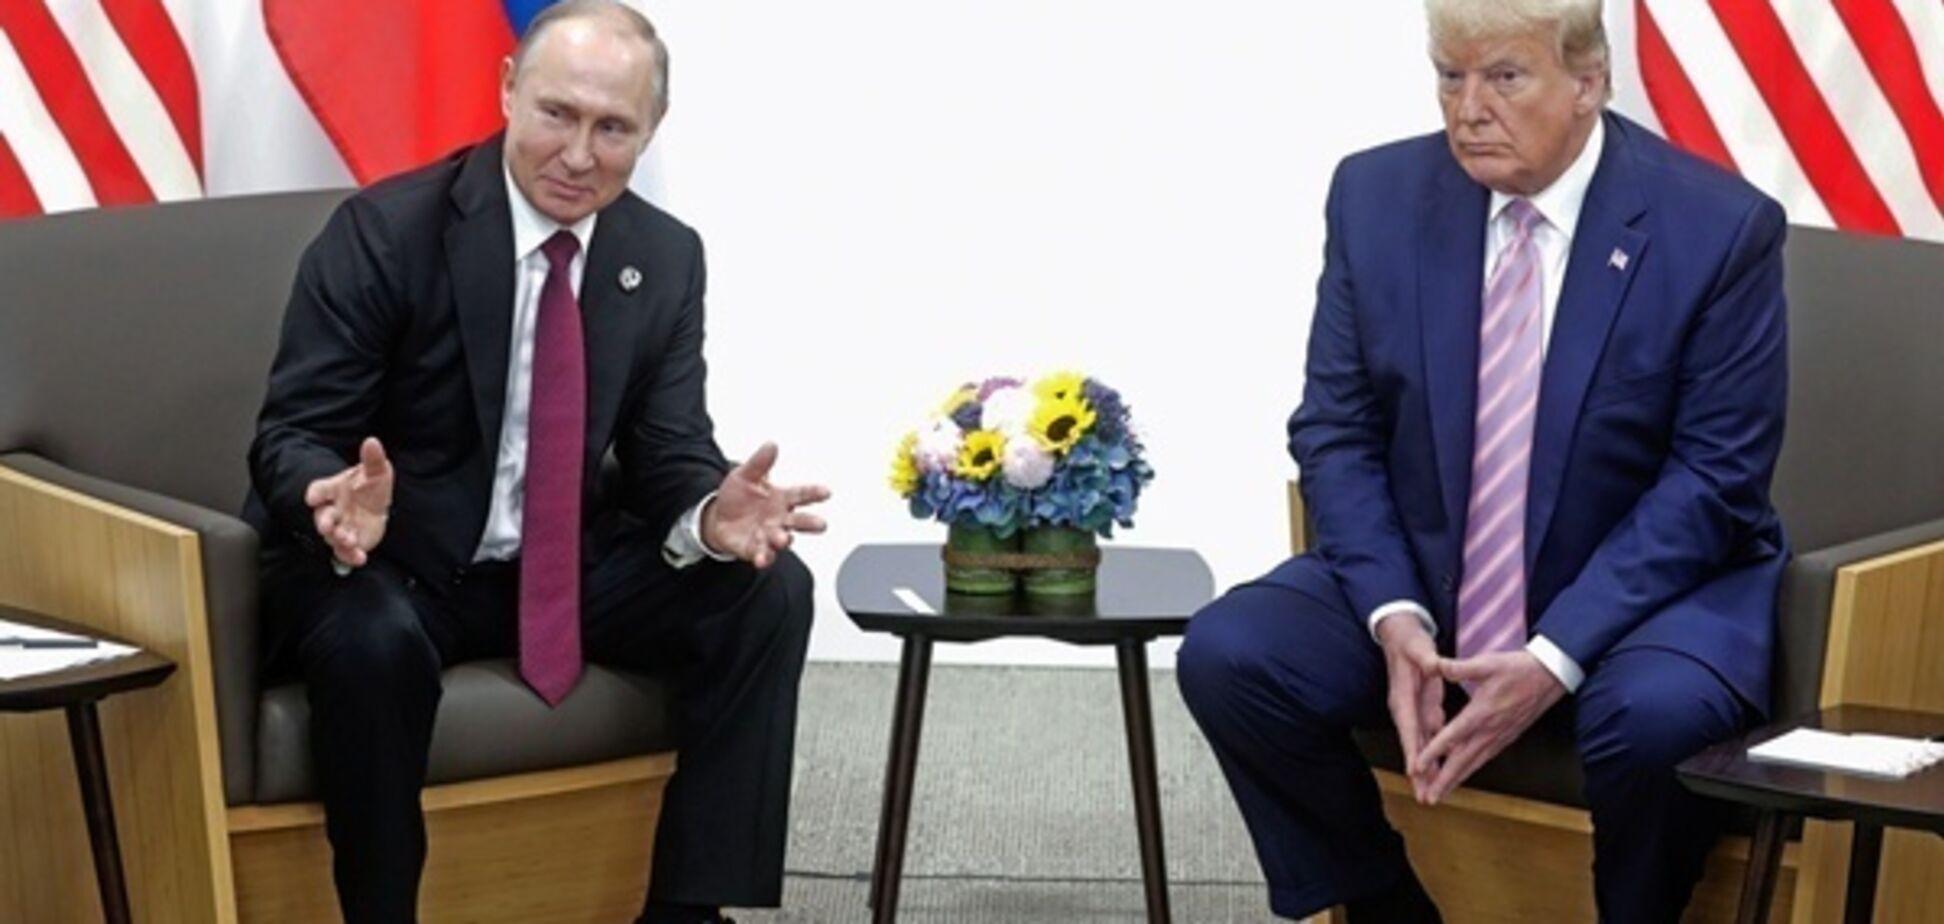 Саммит G7: стало известно, как Трамп 'кинул' Путина